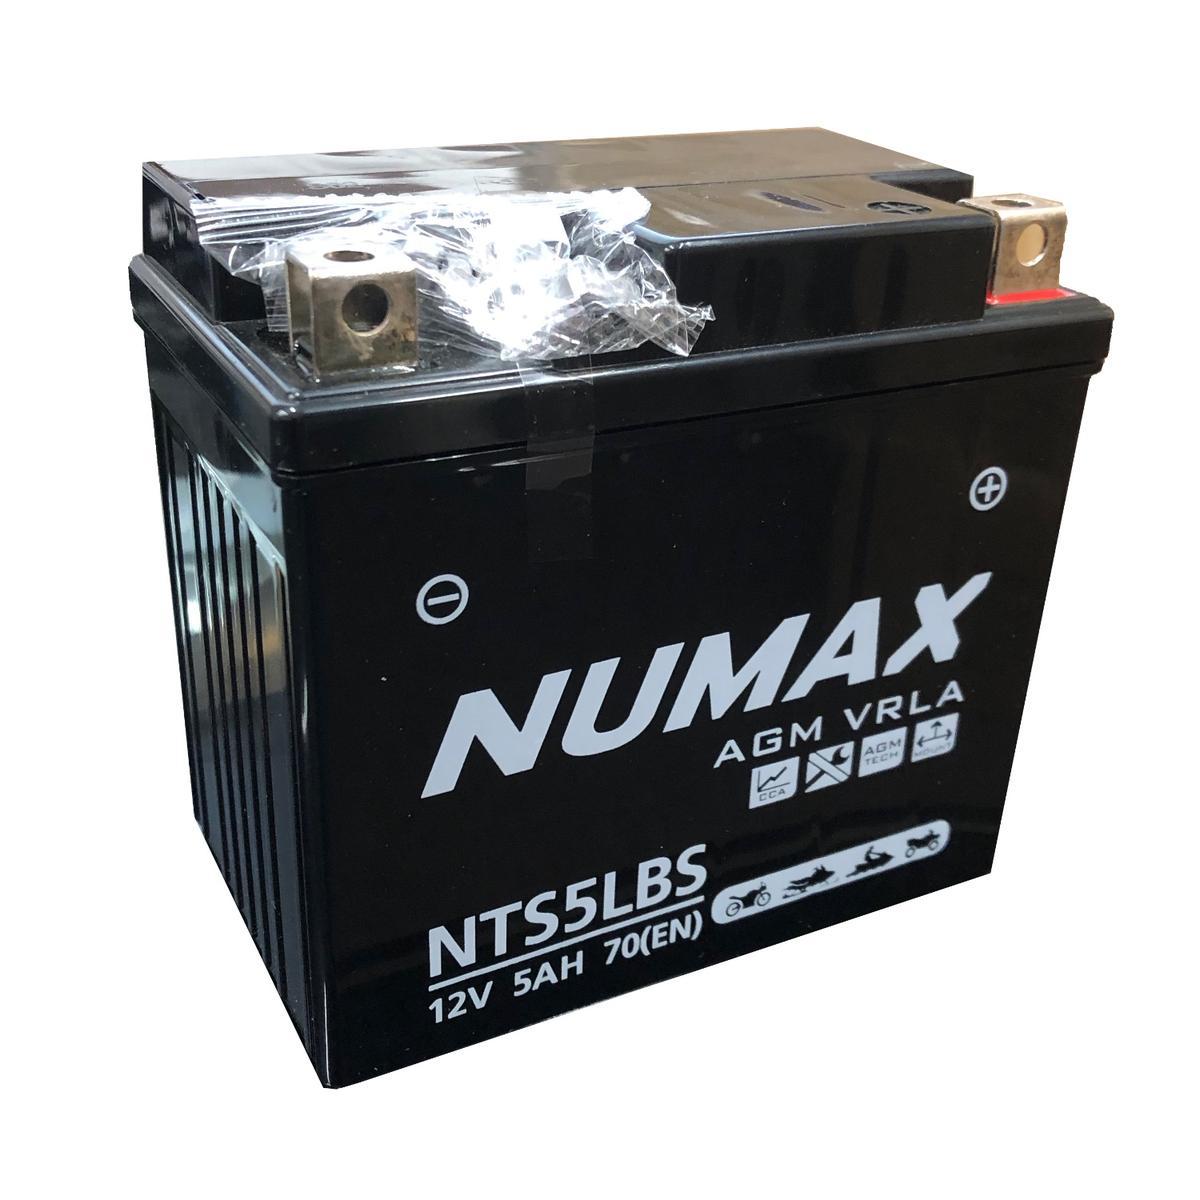 Numax 12v NTS5LBS Motorbike Bike Battery PEUGEOT 100cc Trekker YTX5L-4